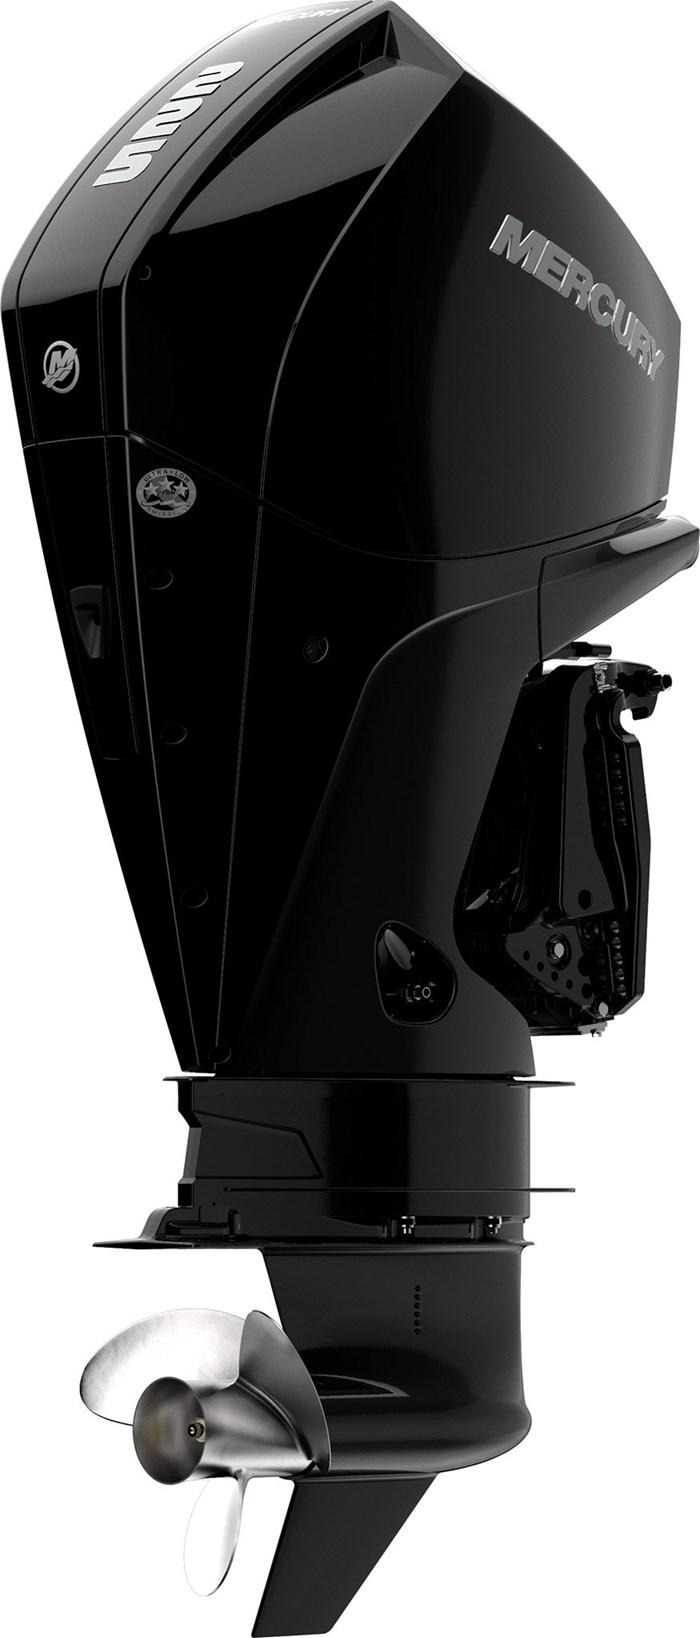 2020 Mercury 225CXL V-6 4-Stroke DTS Photo 11 of 23